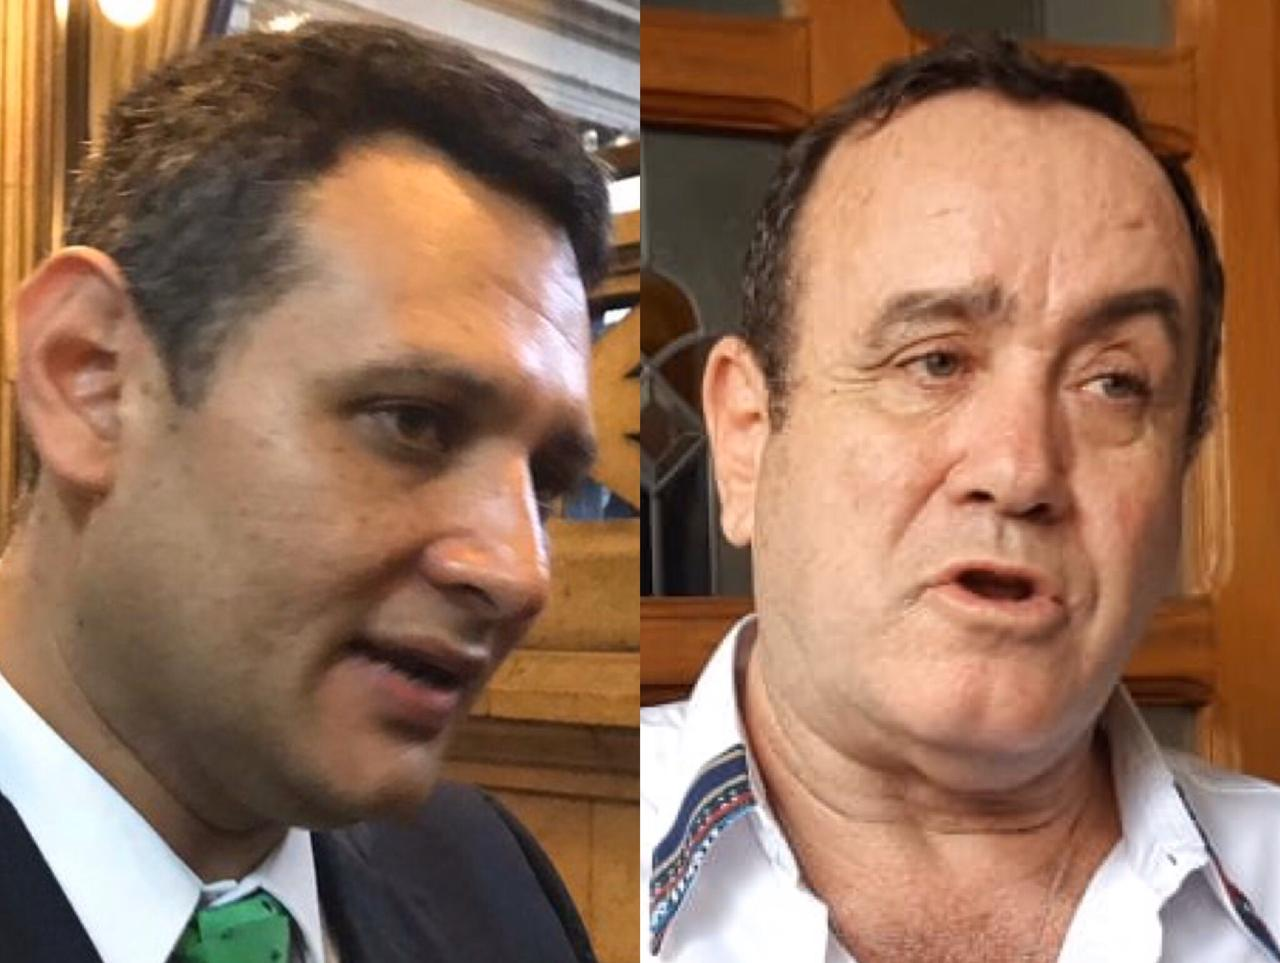 Diputado Óscar Argueta señala a Giammattei de reunirse con congresistas Estuardo Vargas y Carlos López